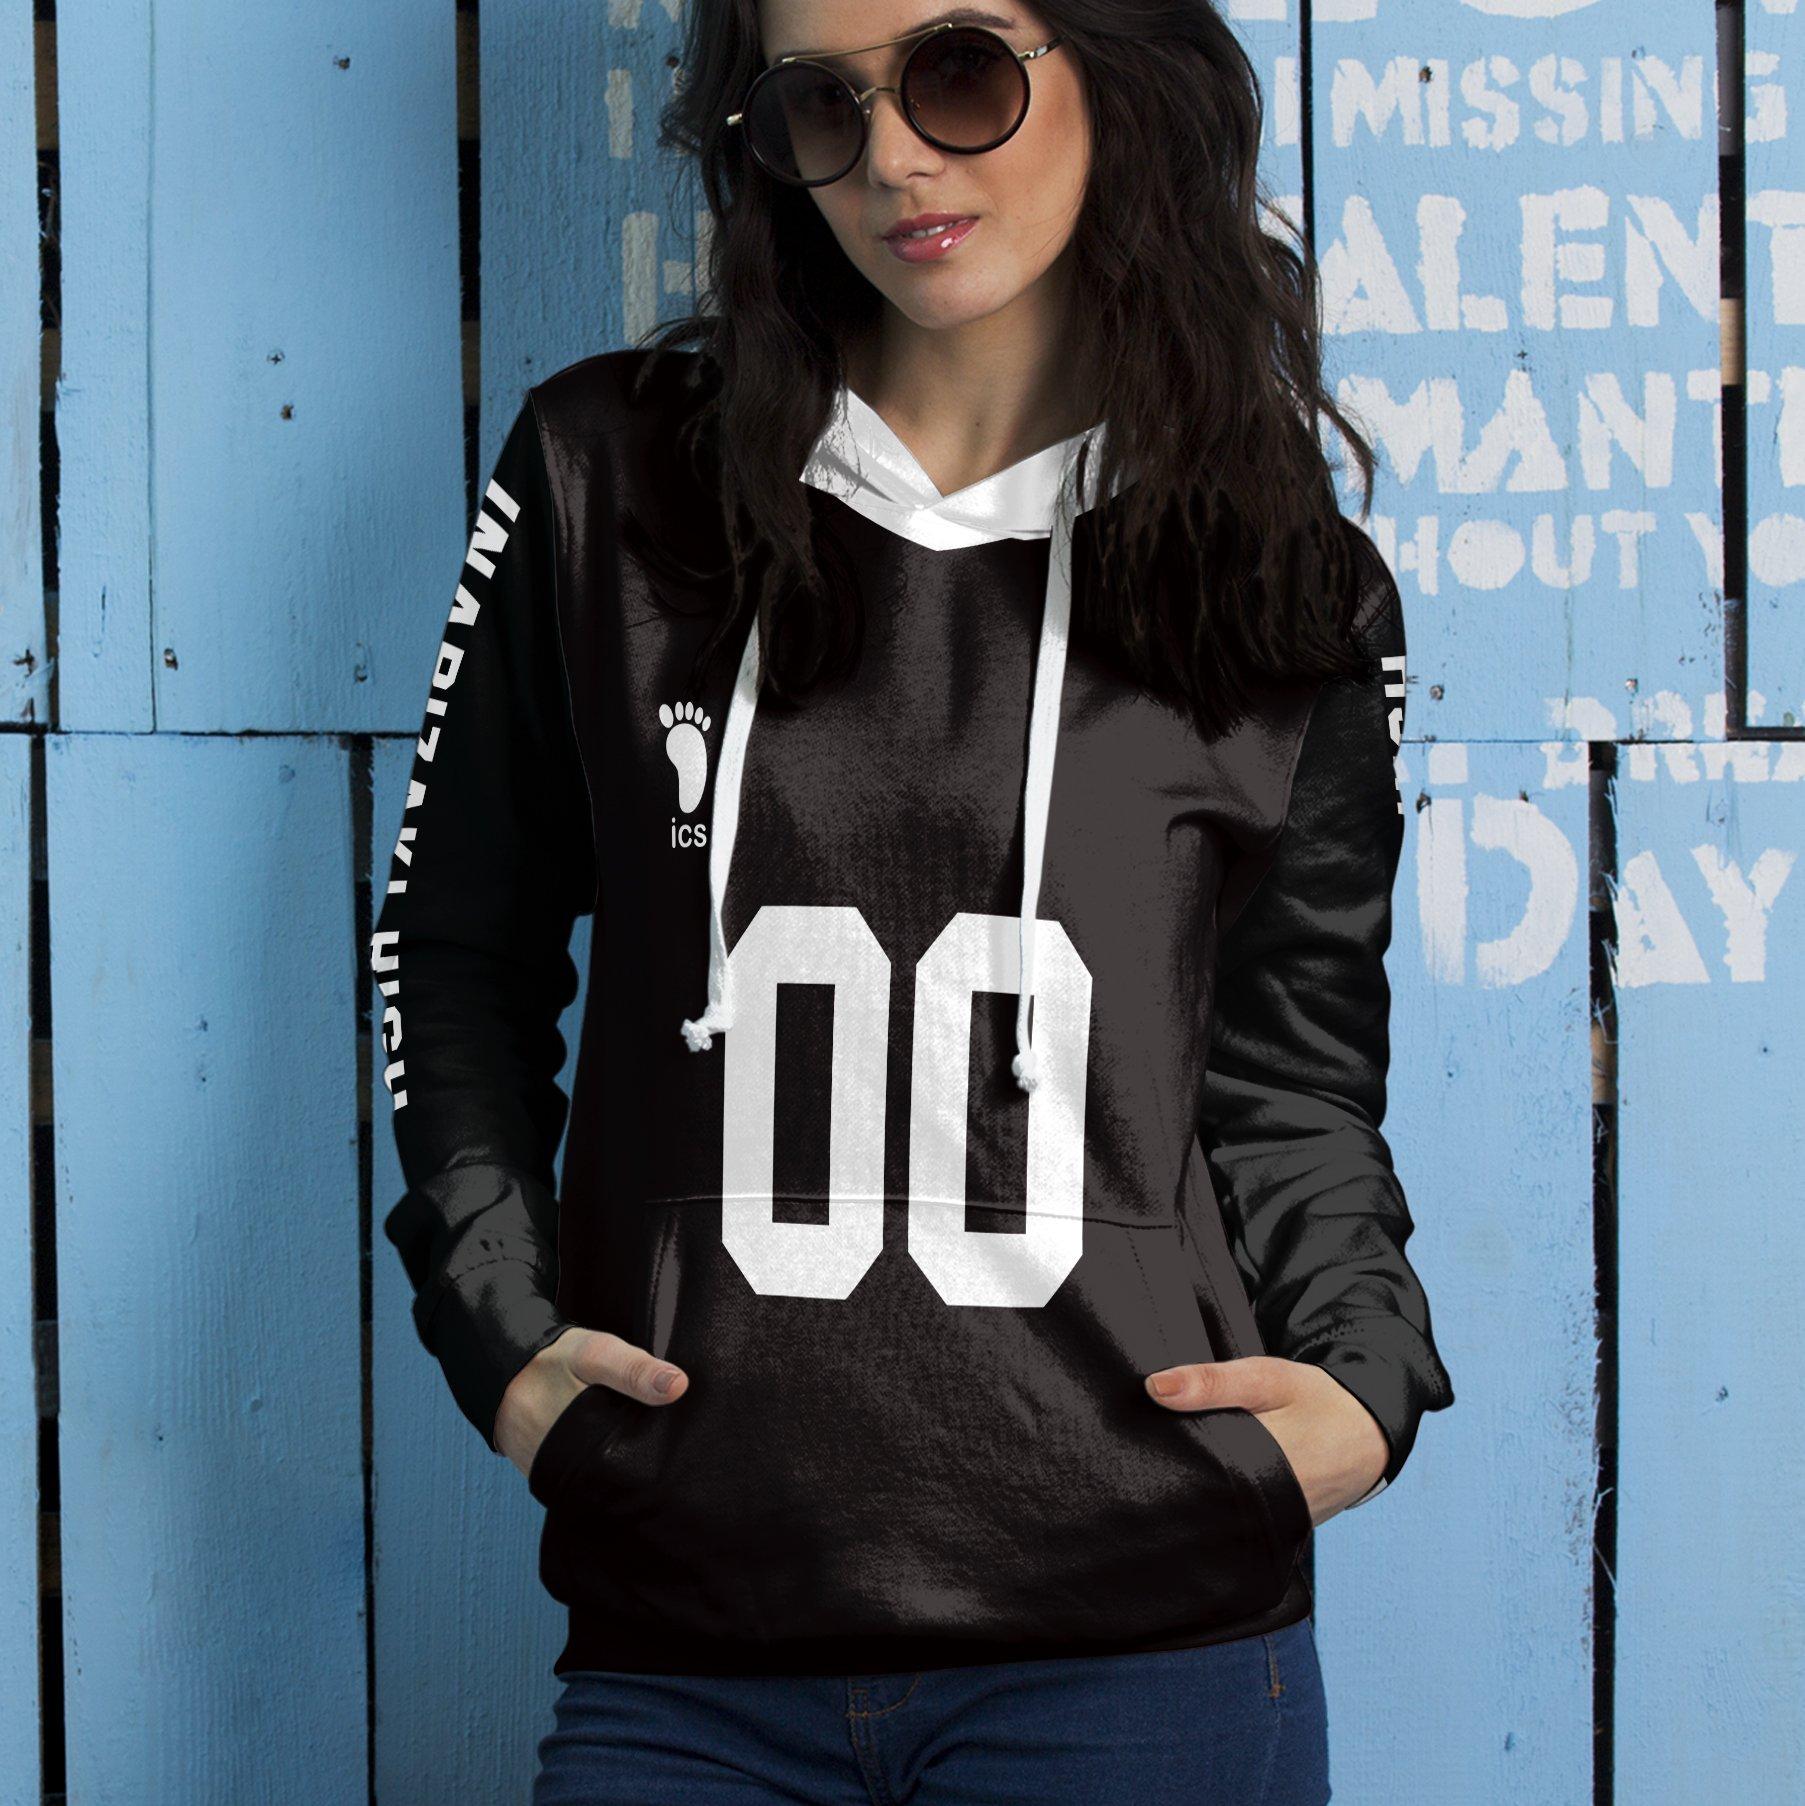 personalized team inarizaki unisex pullover hoodie 724138 - Otaku Treat